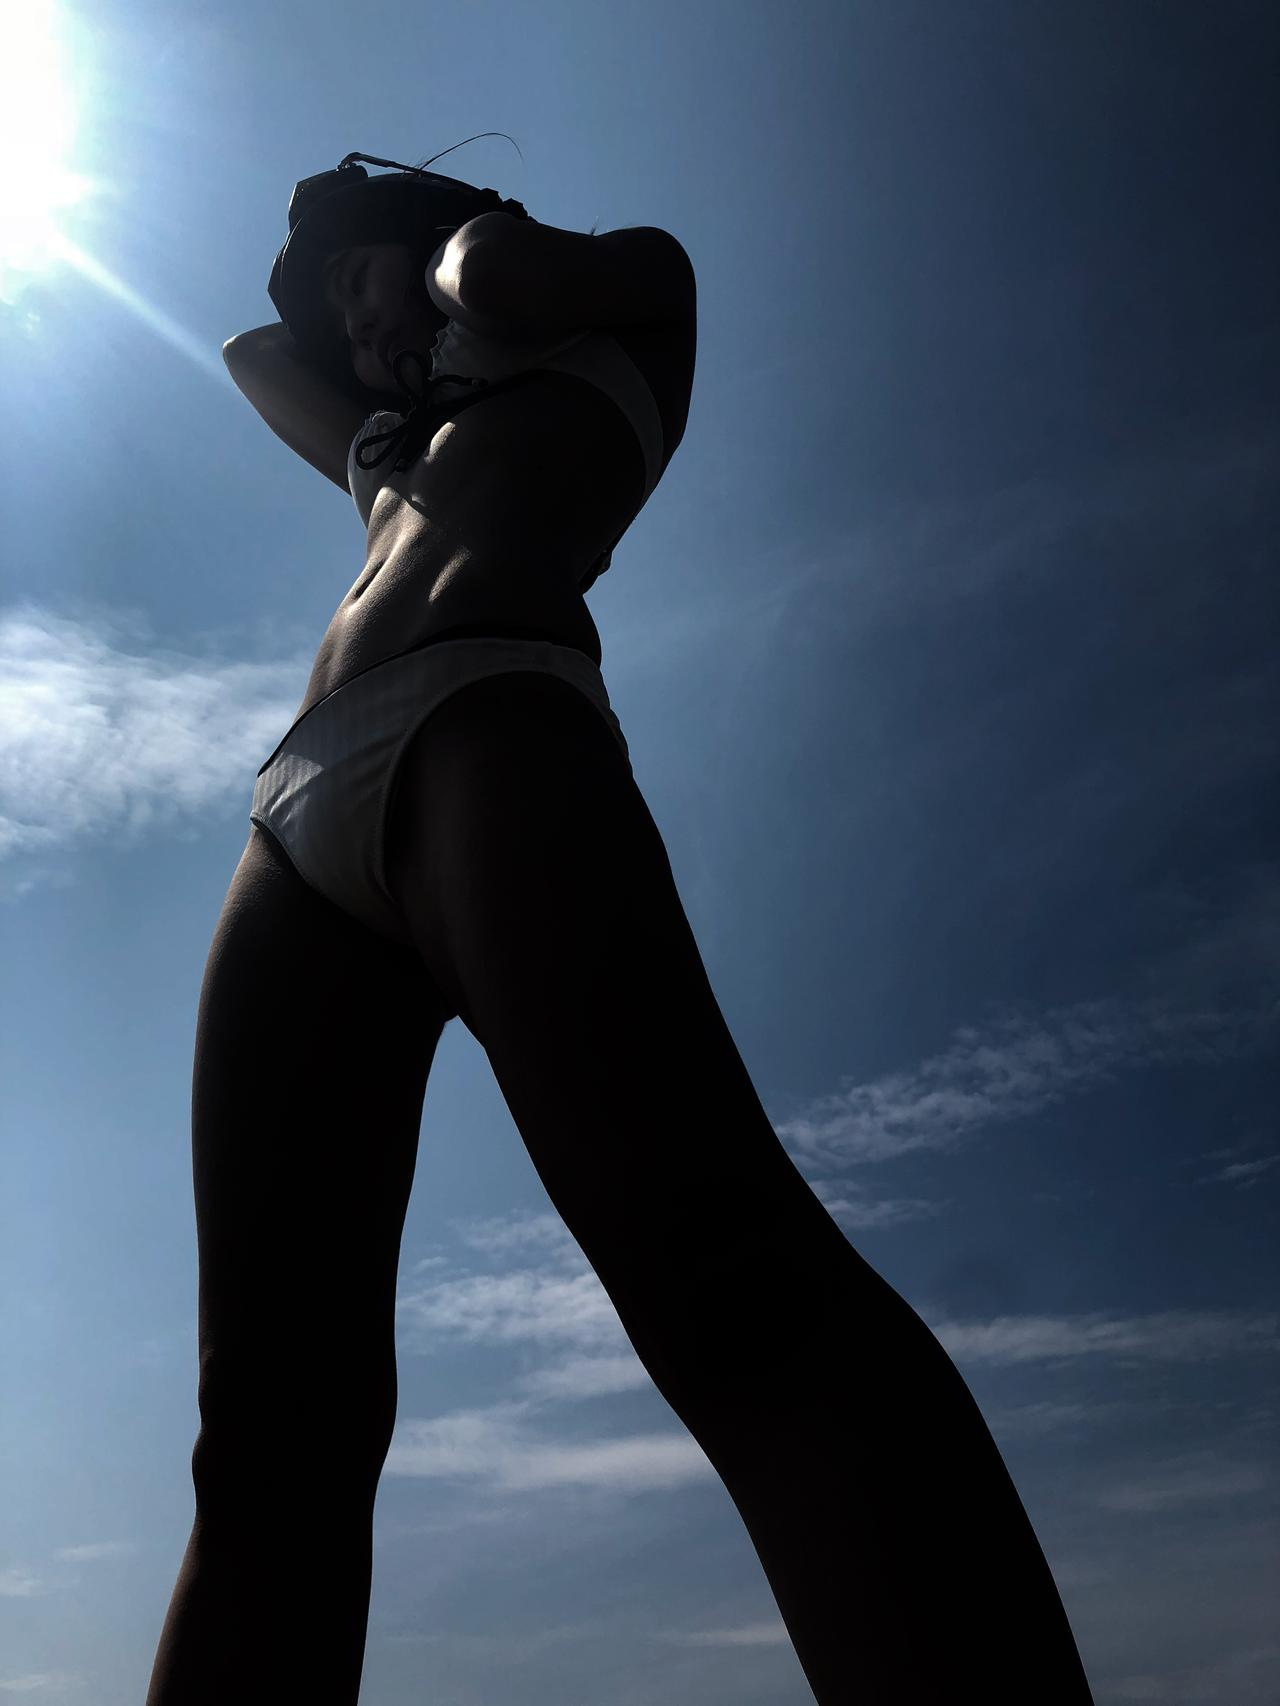 Images : 2番目の画像 - 「グラビア【ヘルメット女子】Sabrina vol.05」のアルバム - LAWRENCE - Motorcycle x Cars + α = Your Life.